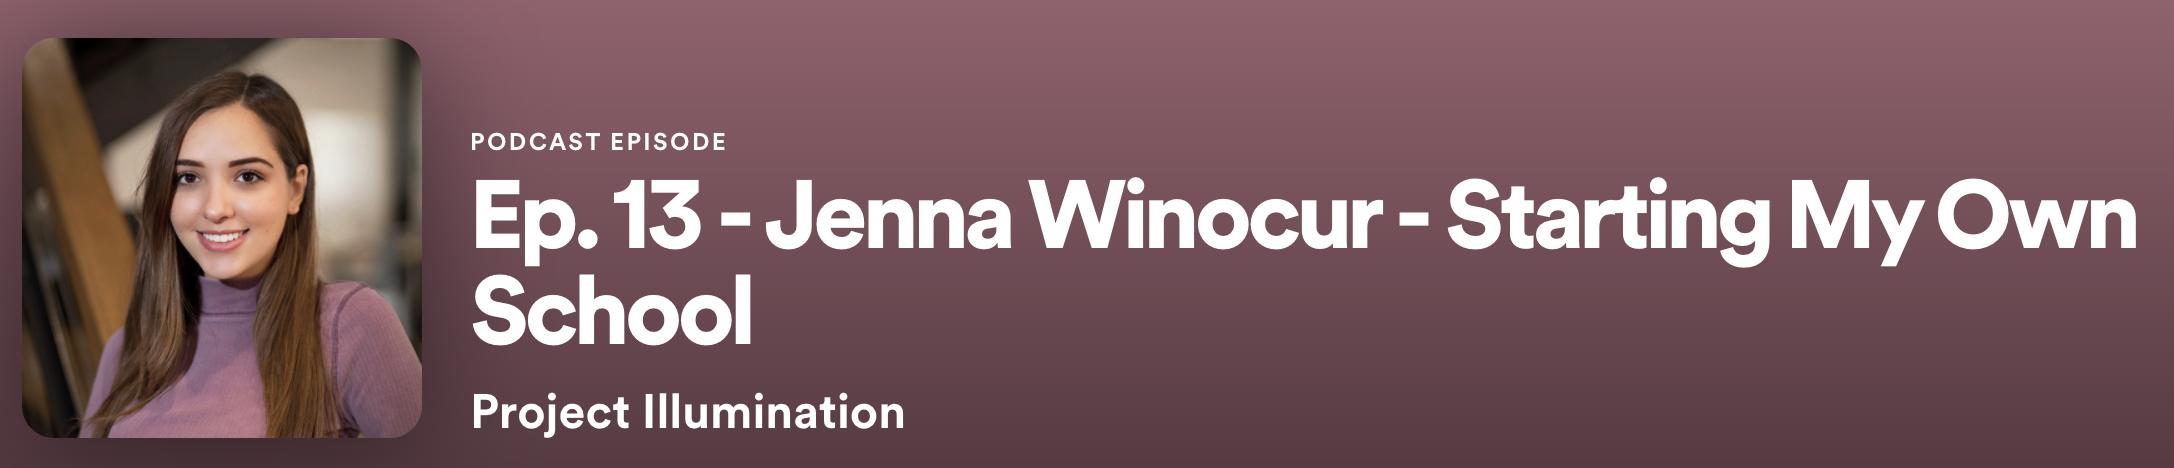 Ep. 13 - Jenna Winocur - Starting My Own School Project Illumination Podcast Episode